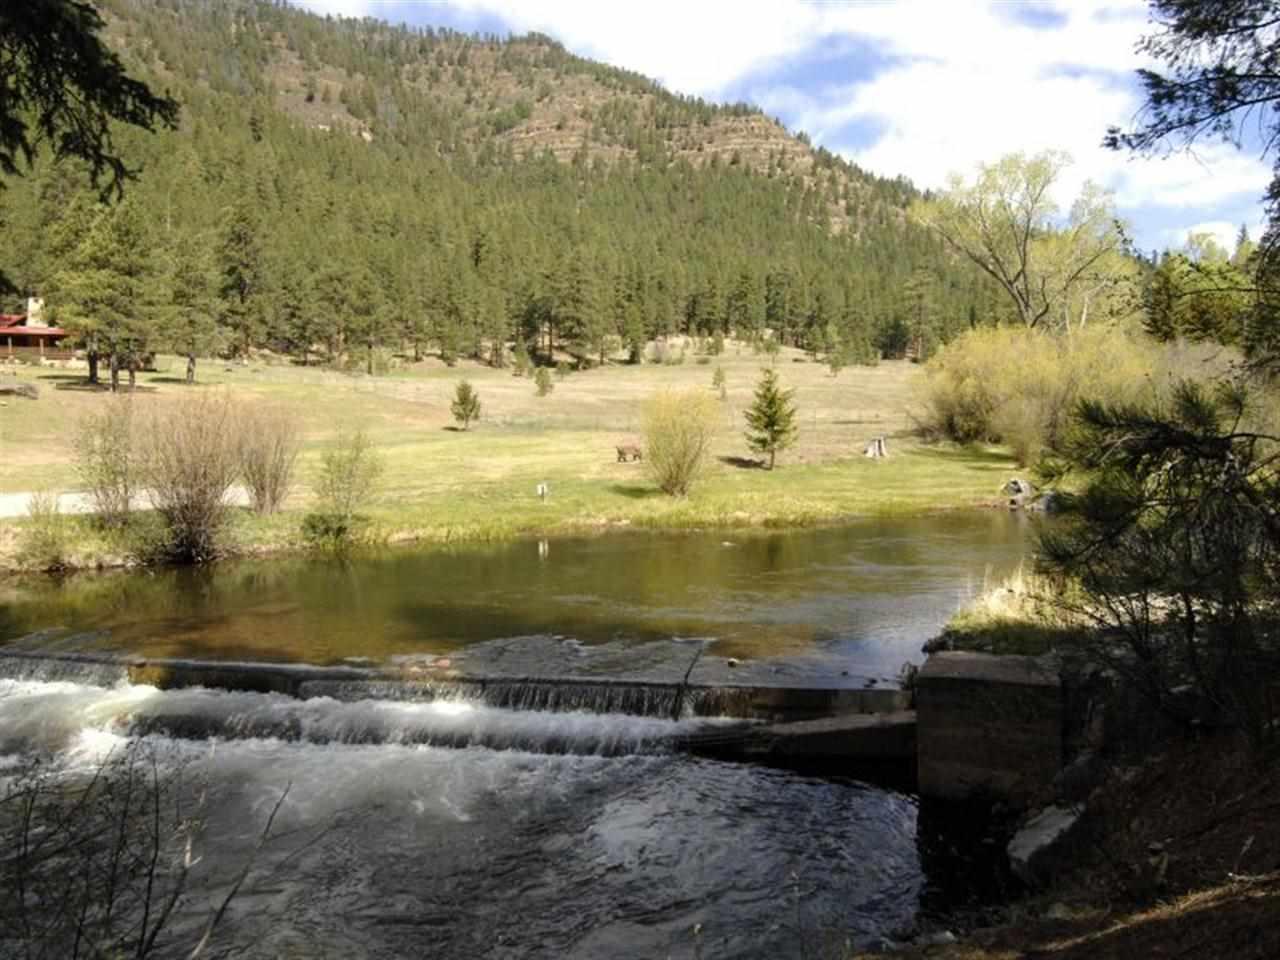 28 tres lagunas pecos nm 87552 mls 201304545 for Pecos river fishing